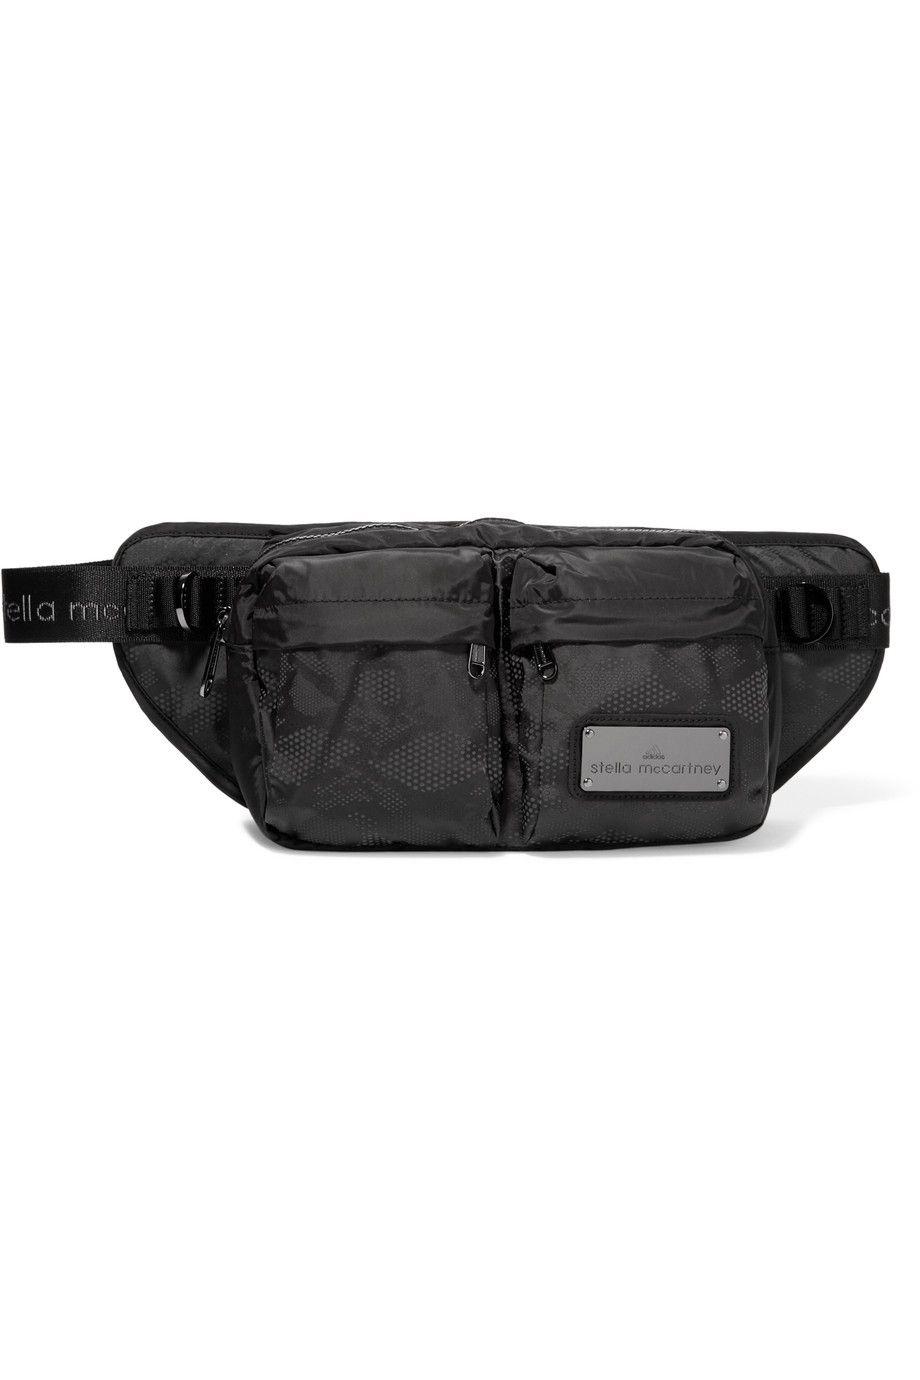 7415613e22 ADIDAS BY STELLA MCCARTNEY Printed Shell Belt Bag.  adidasbystellamccartney   bags  belt bags